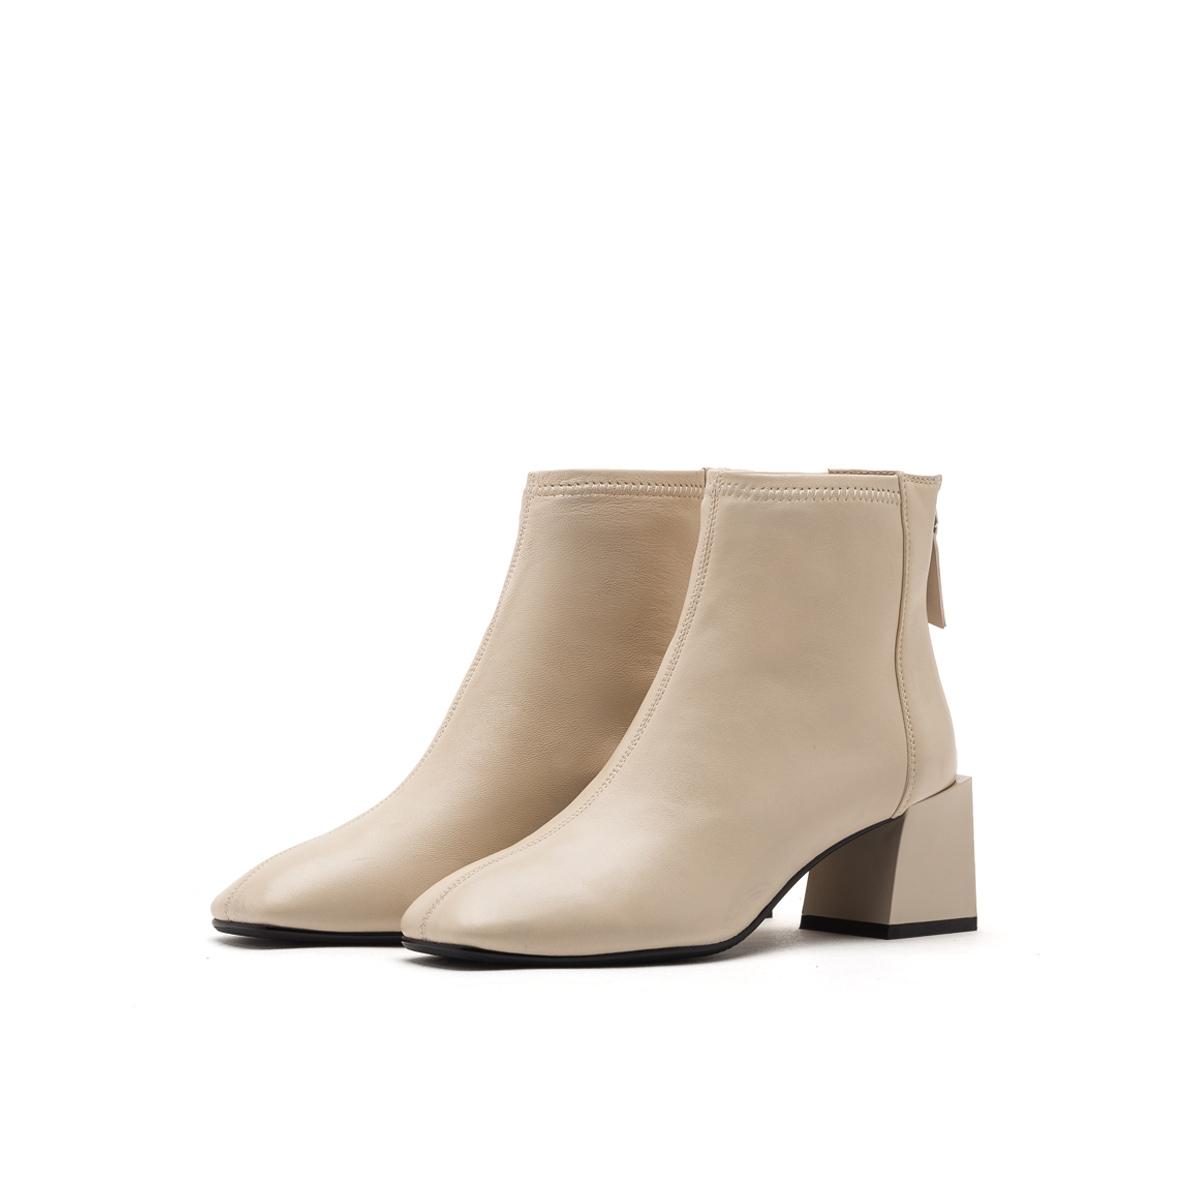 SS94116661 冬季新款粗跟高跟鞋女短靴潮 2019 星期六 券 90 付定送